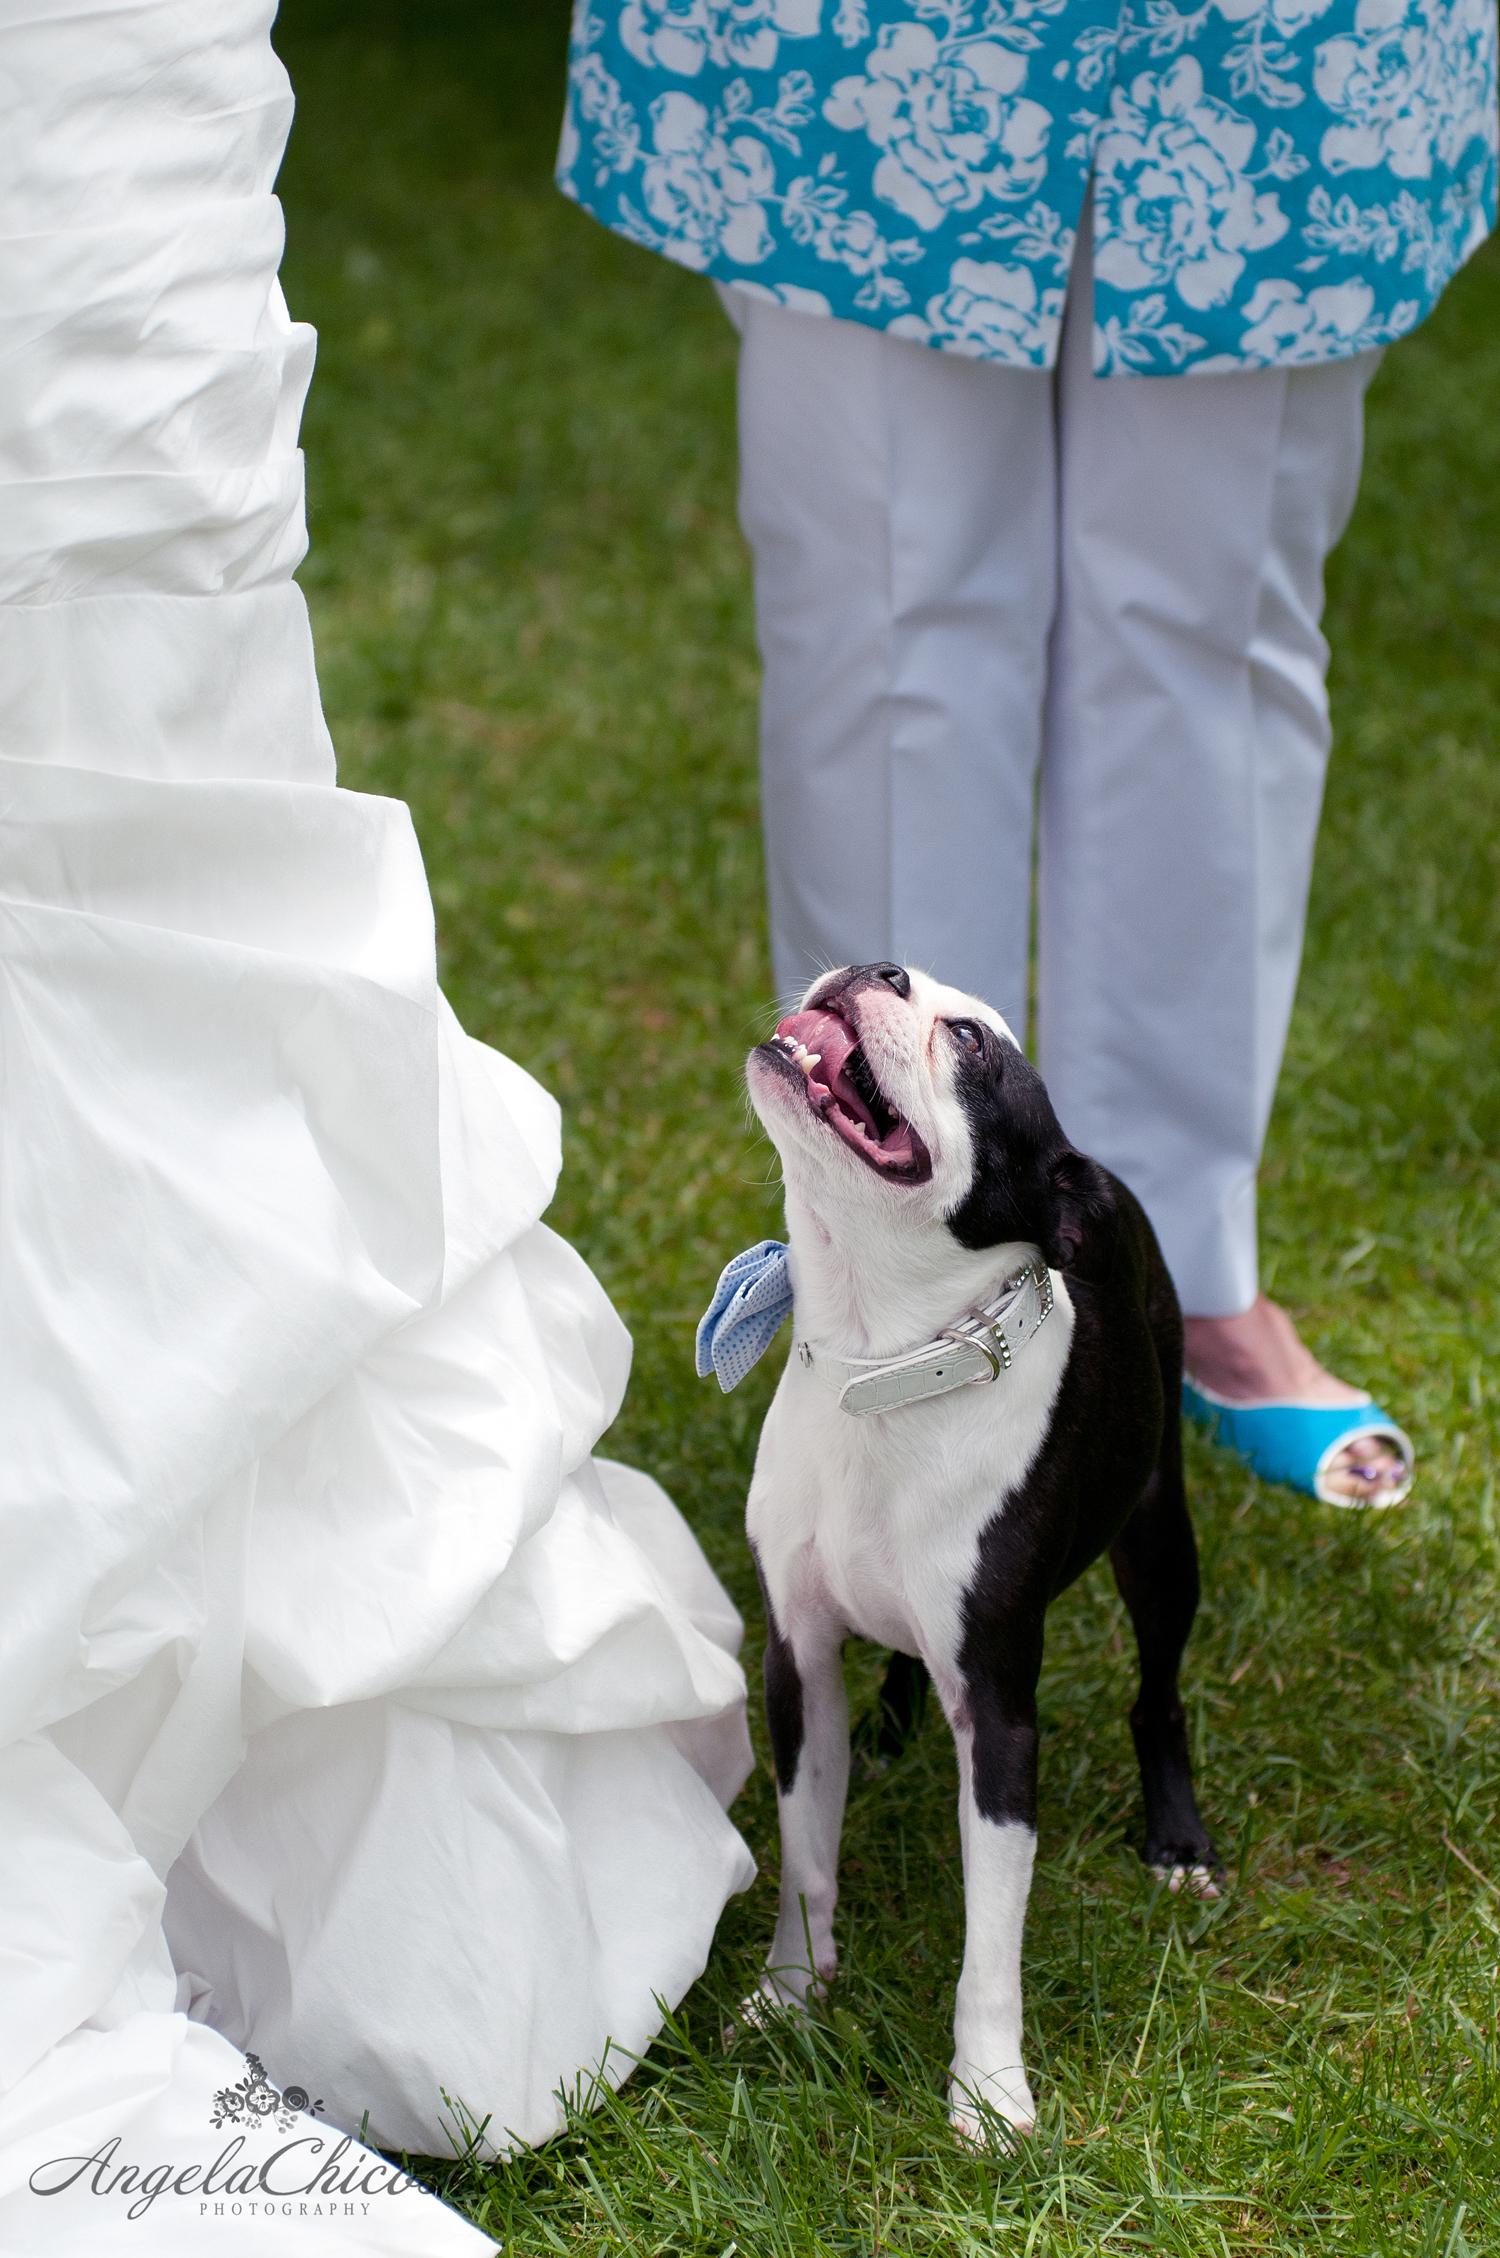 Angela_Chicoski_CT_wedding_photographer_019.jpg